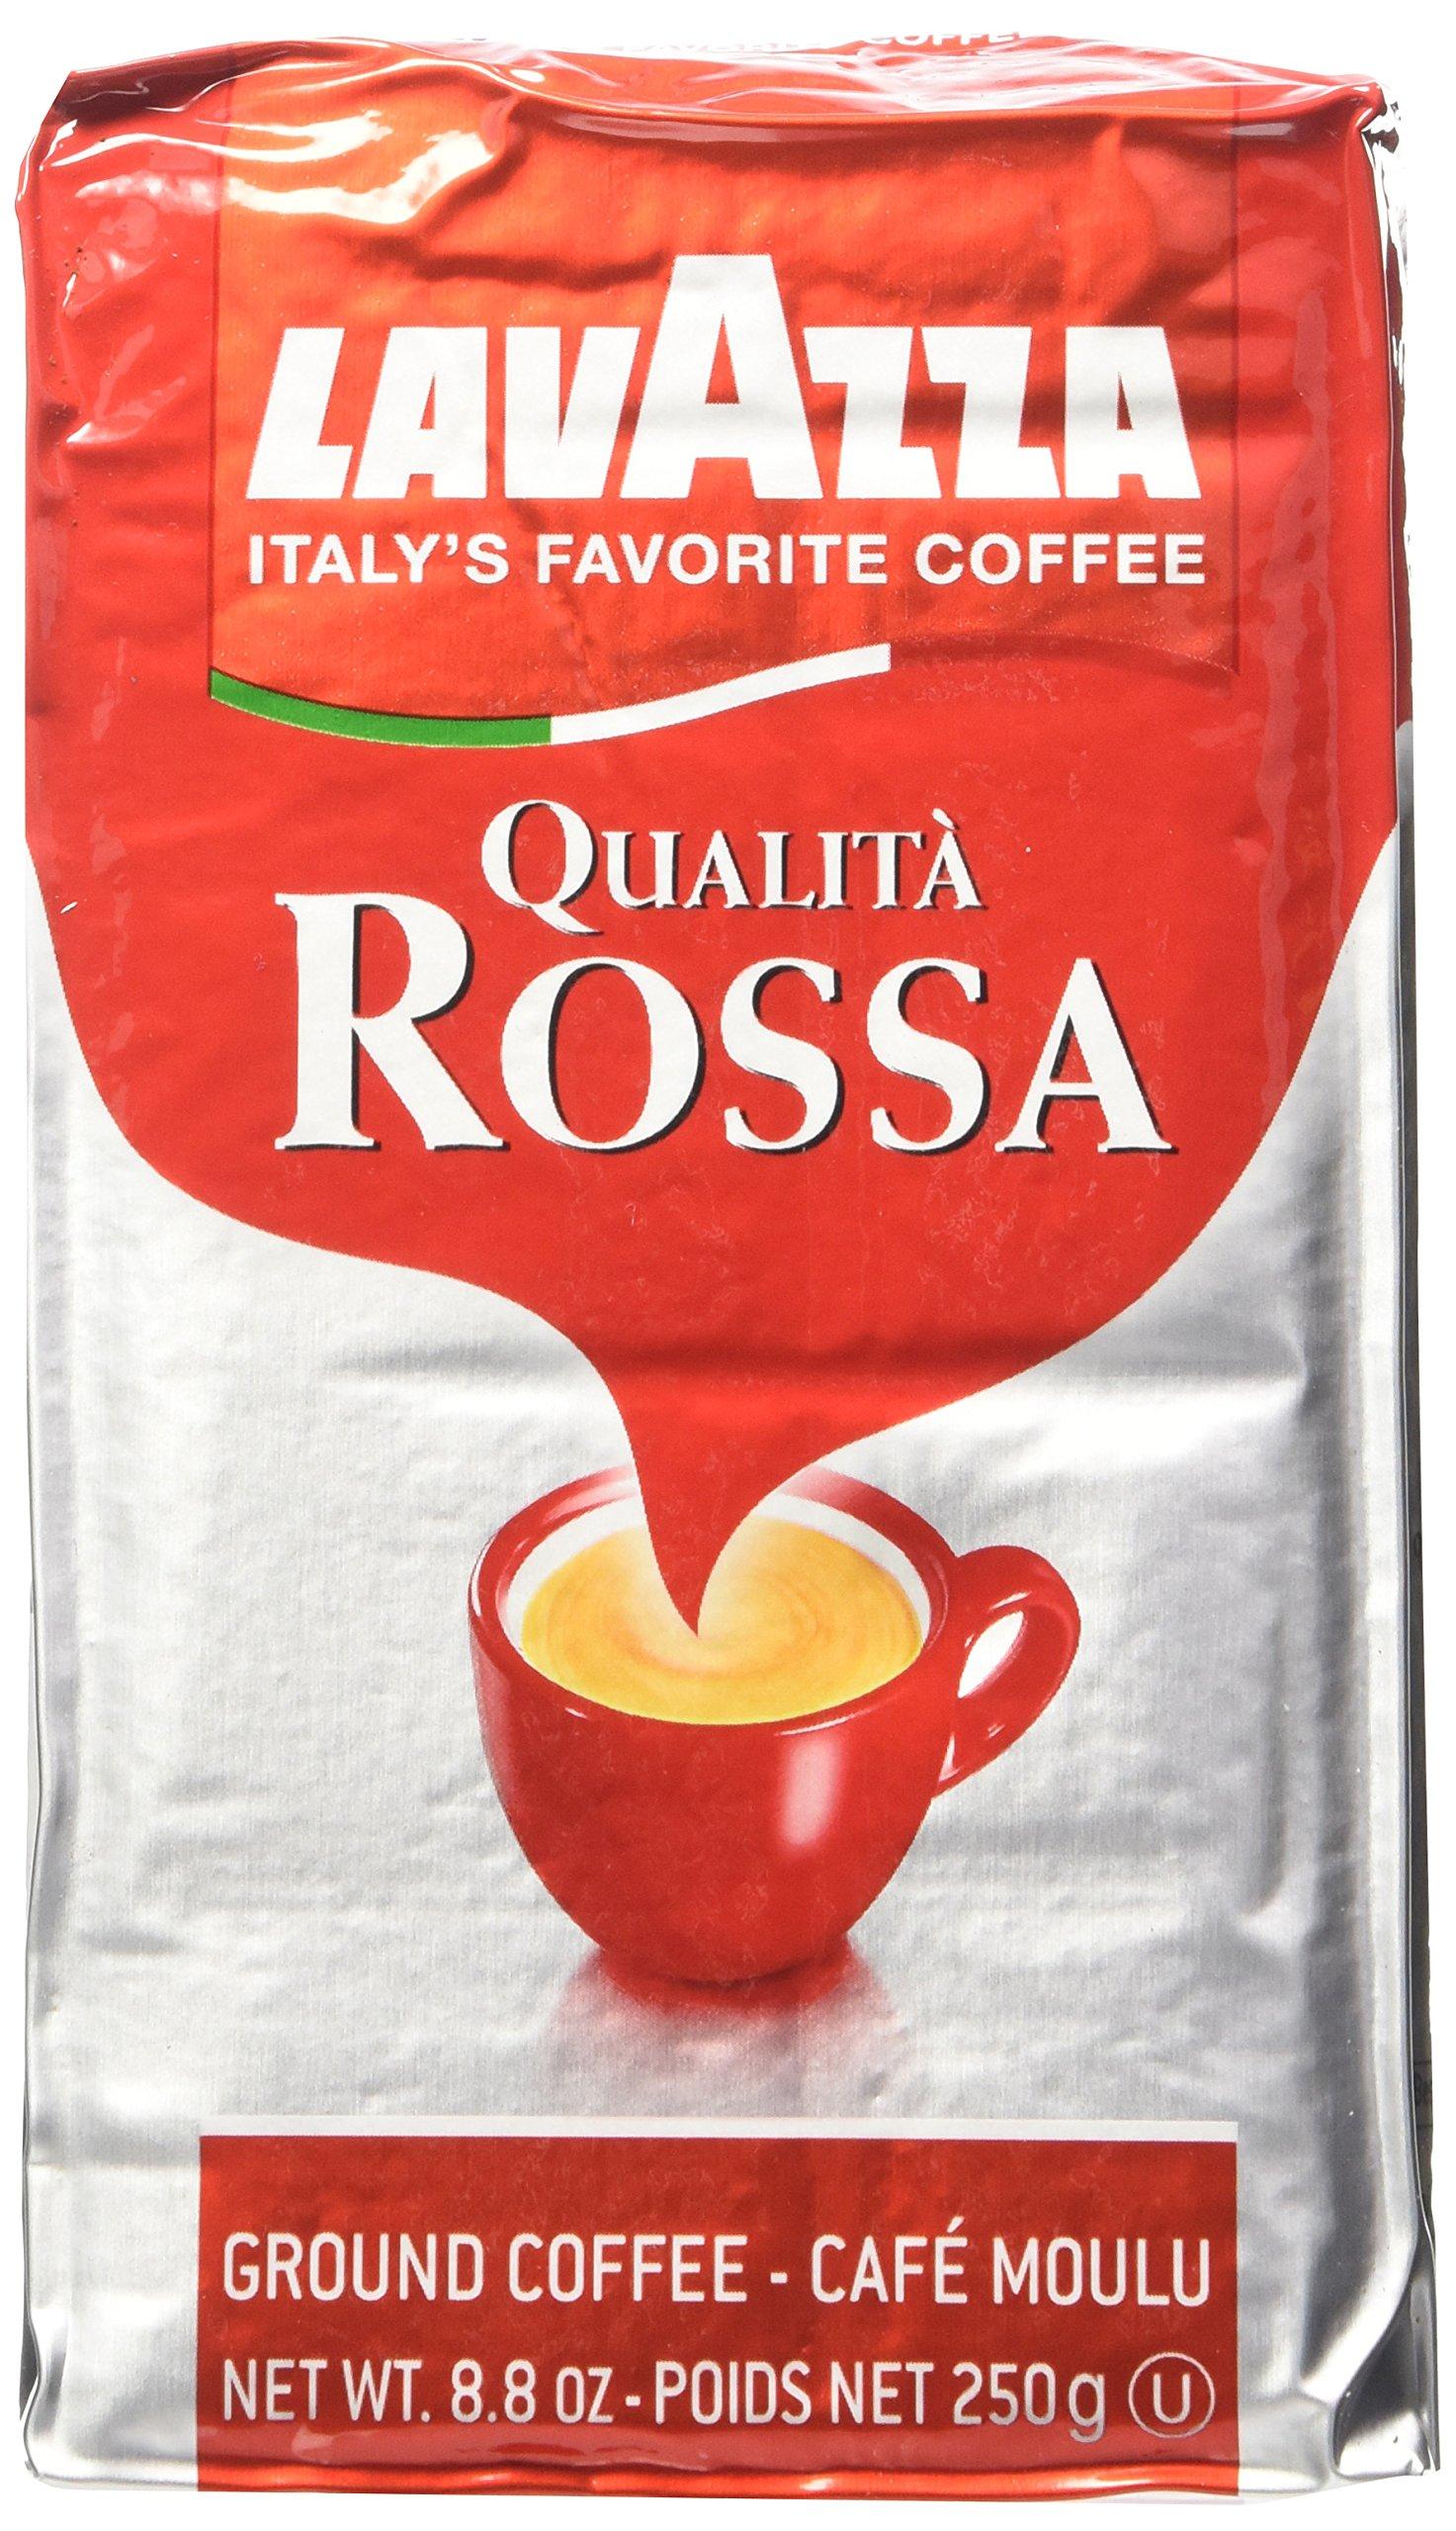 Lavazza Italian ''Qualita Rossa'' Ground Espresso (1 case = 20 x 8.8 oz bricks)